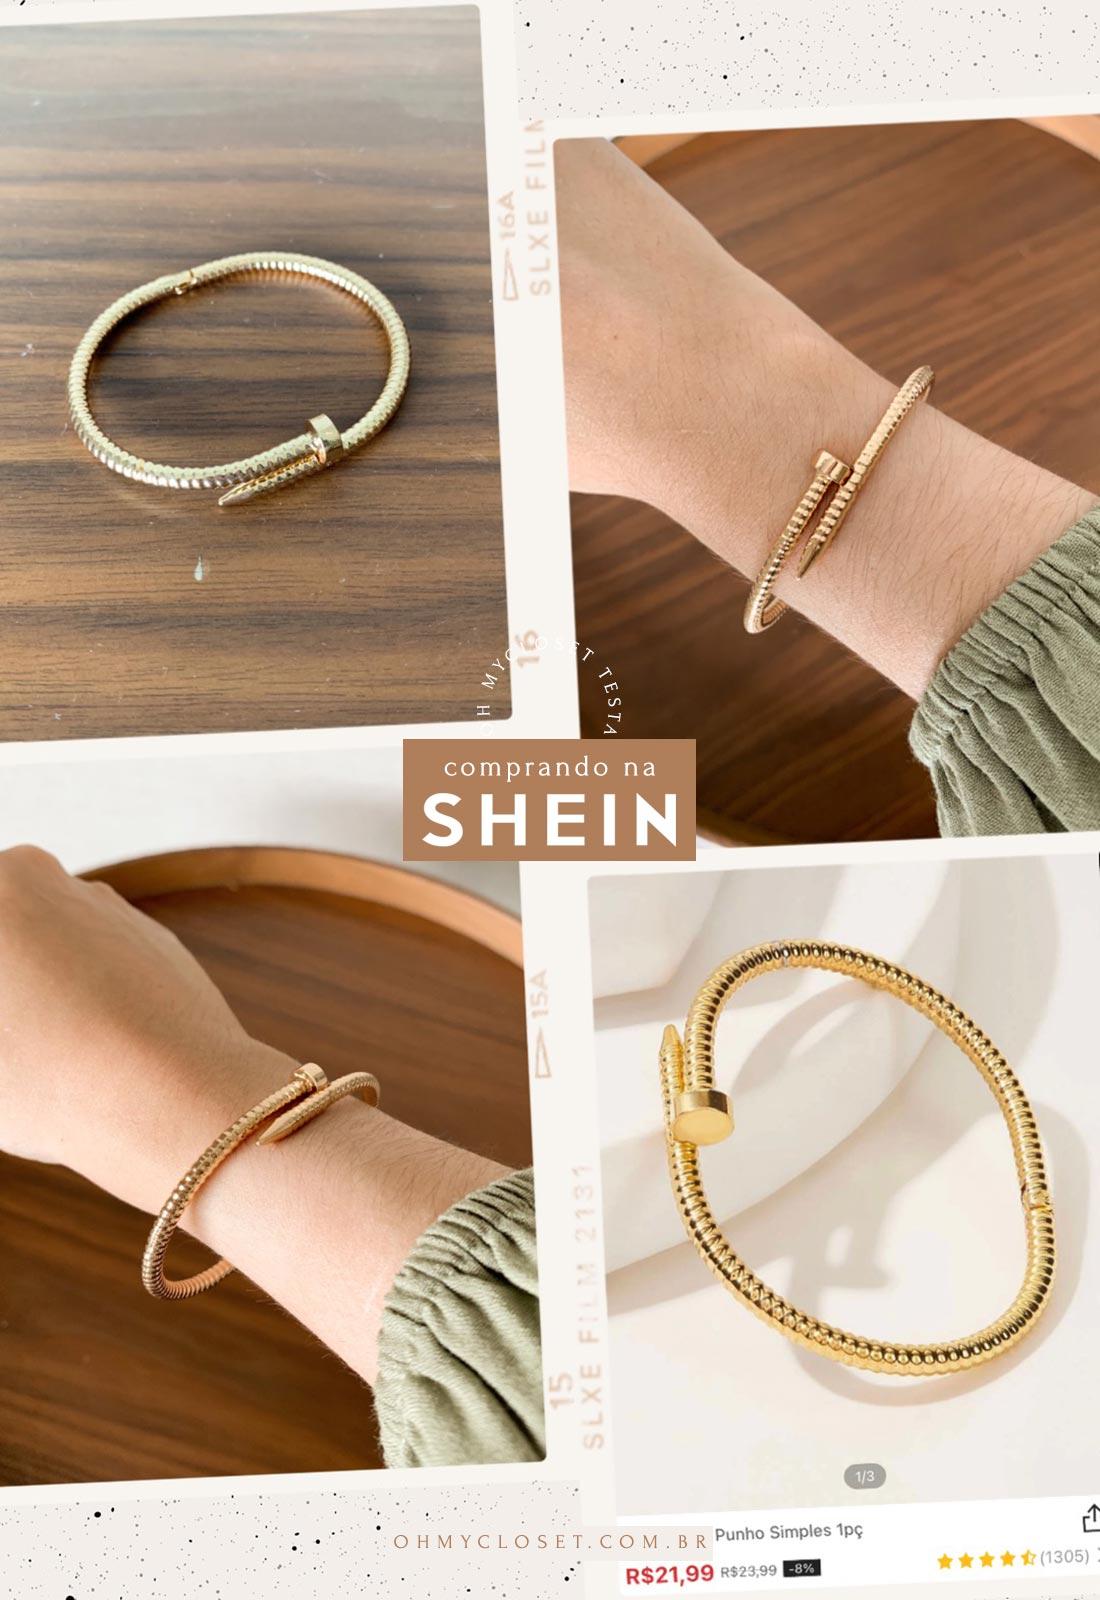 Mais acessórios da SHEIN, pulseiras.